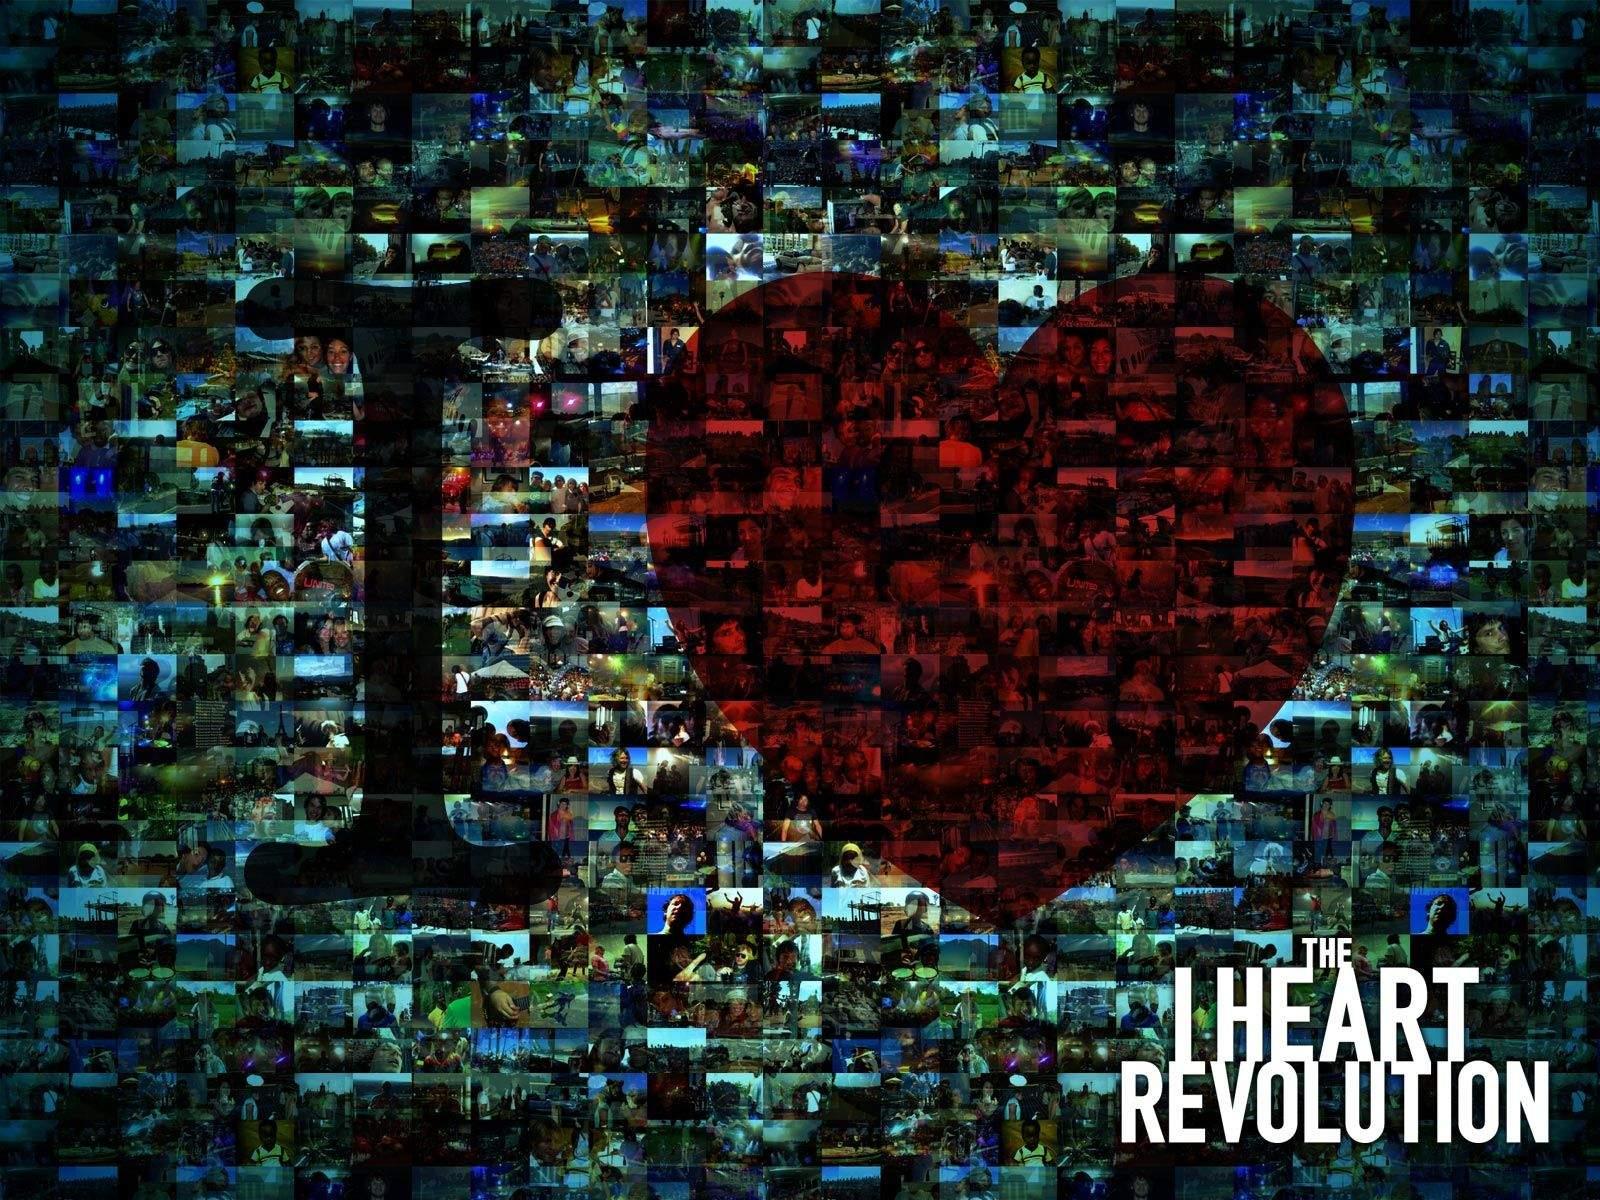 http://3.bp.blogspot.com/-DGbzEIbATTU/T3HjrMIy7BI/AAAAAAAAANo/6v4A4I8hD_U/s1600/the-i-heart-revolution_66_1600x1200.jpg